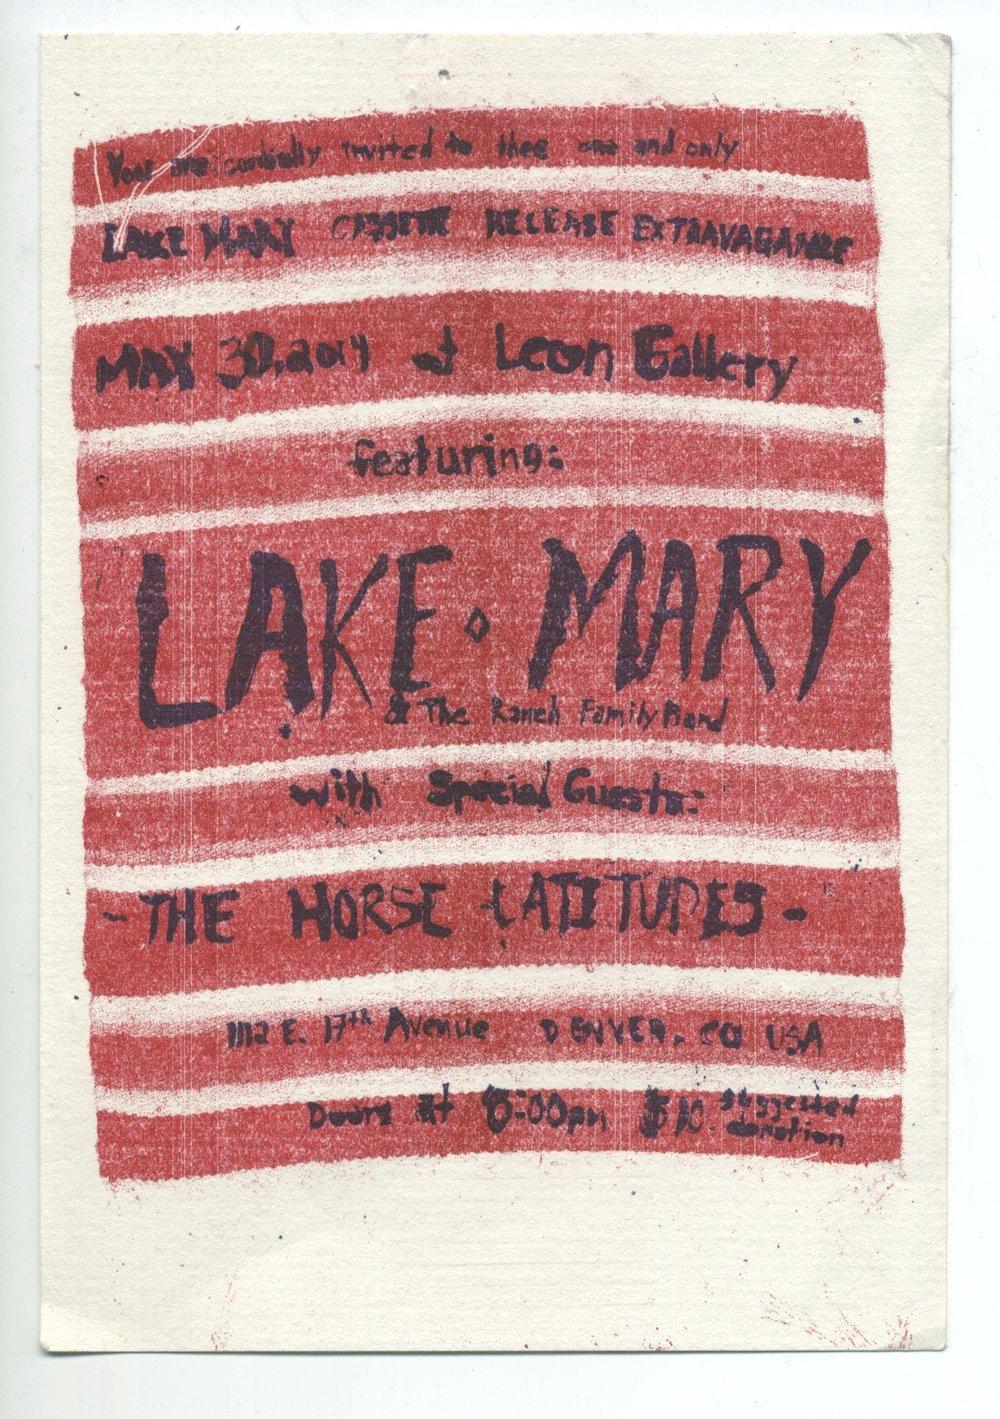 Lake Mary Leon Flier.jpeg